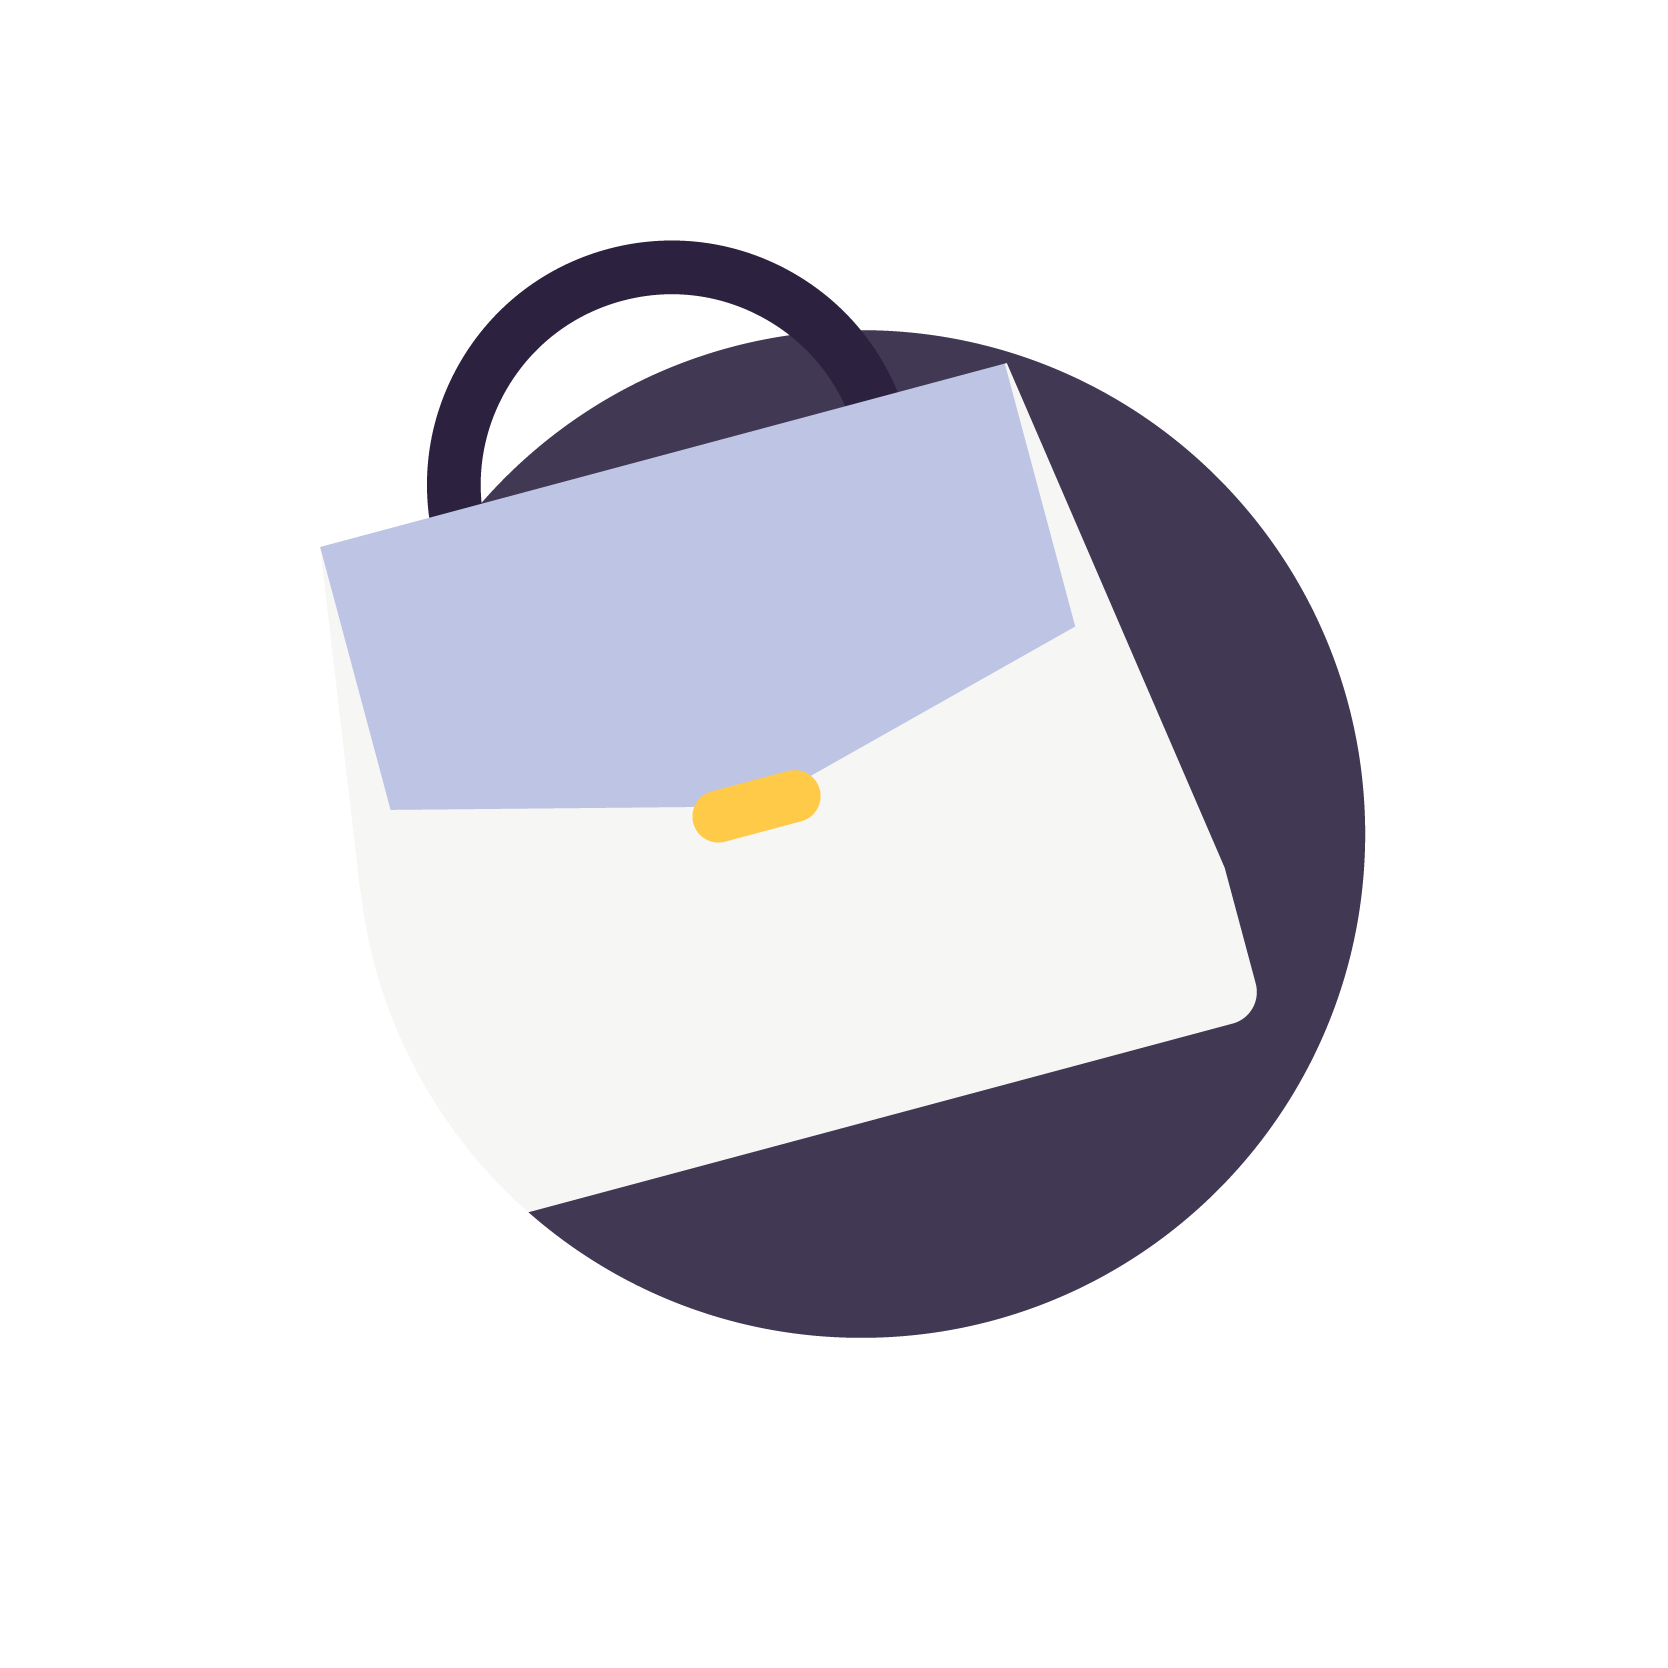 01_SB_Packaging_Icons_R1_Purse